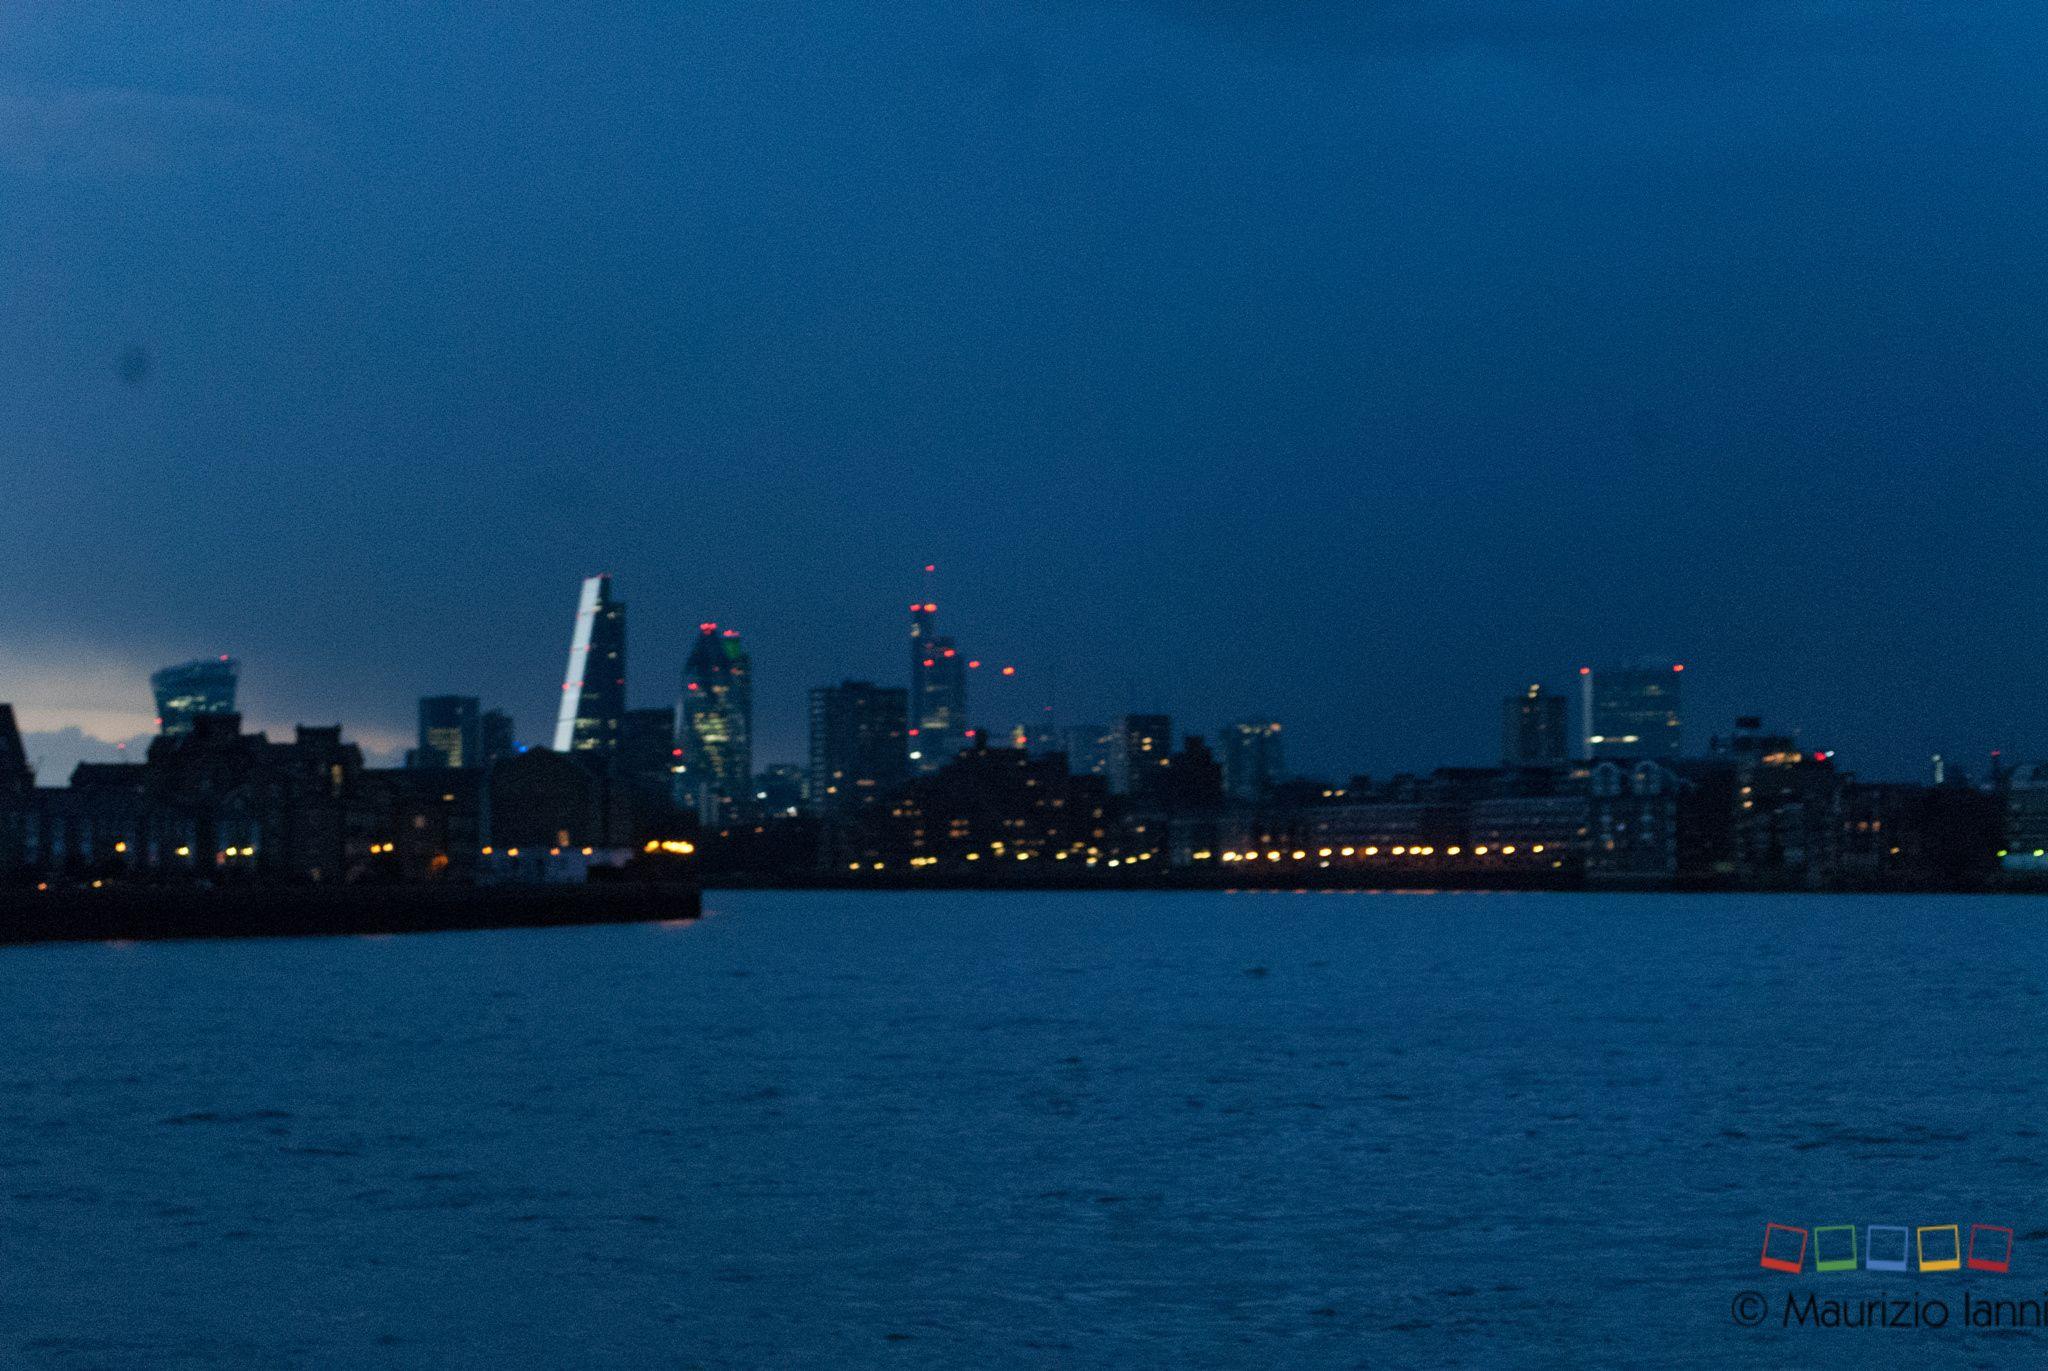 Photograph Canary Wharf by Maurizio Ianni on 500px